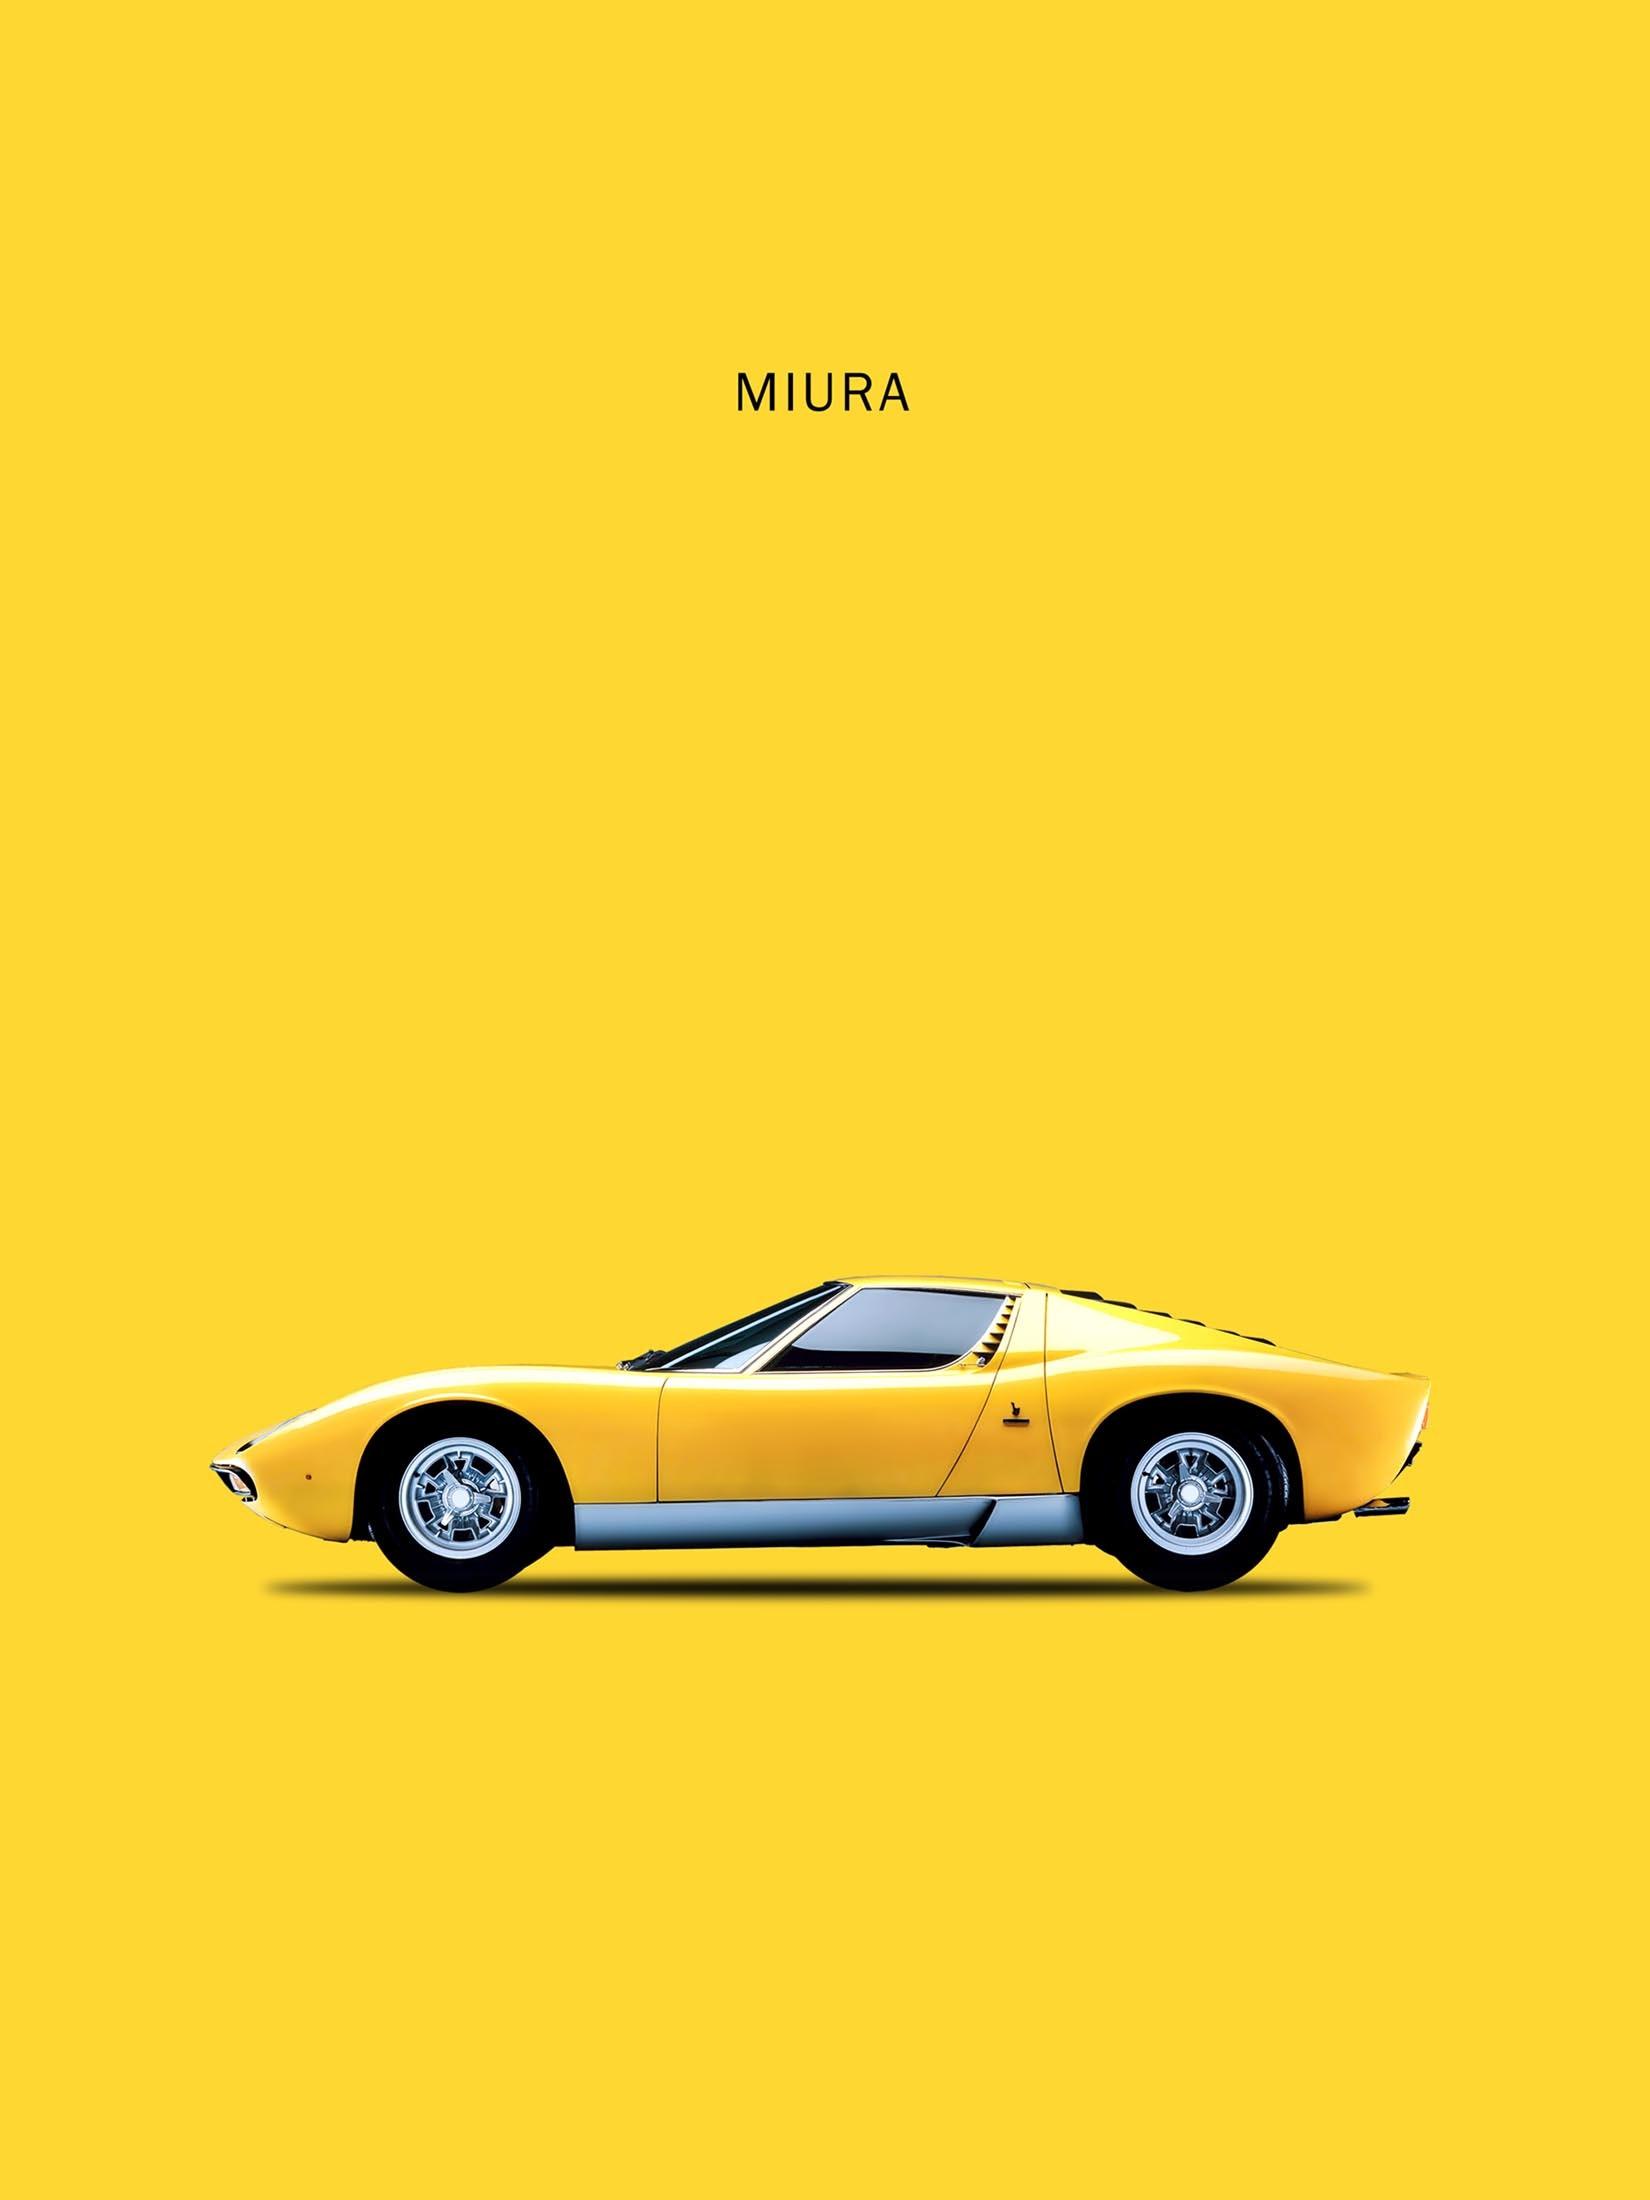 Miura - Yellow